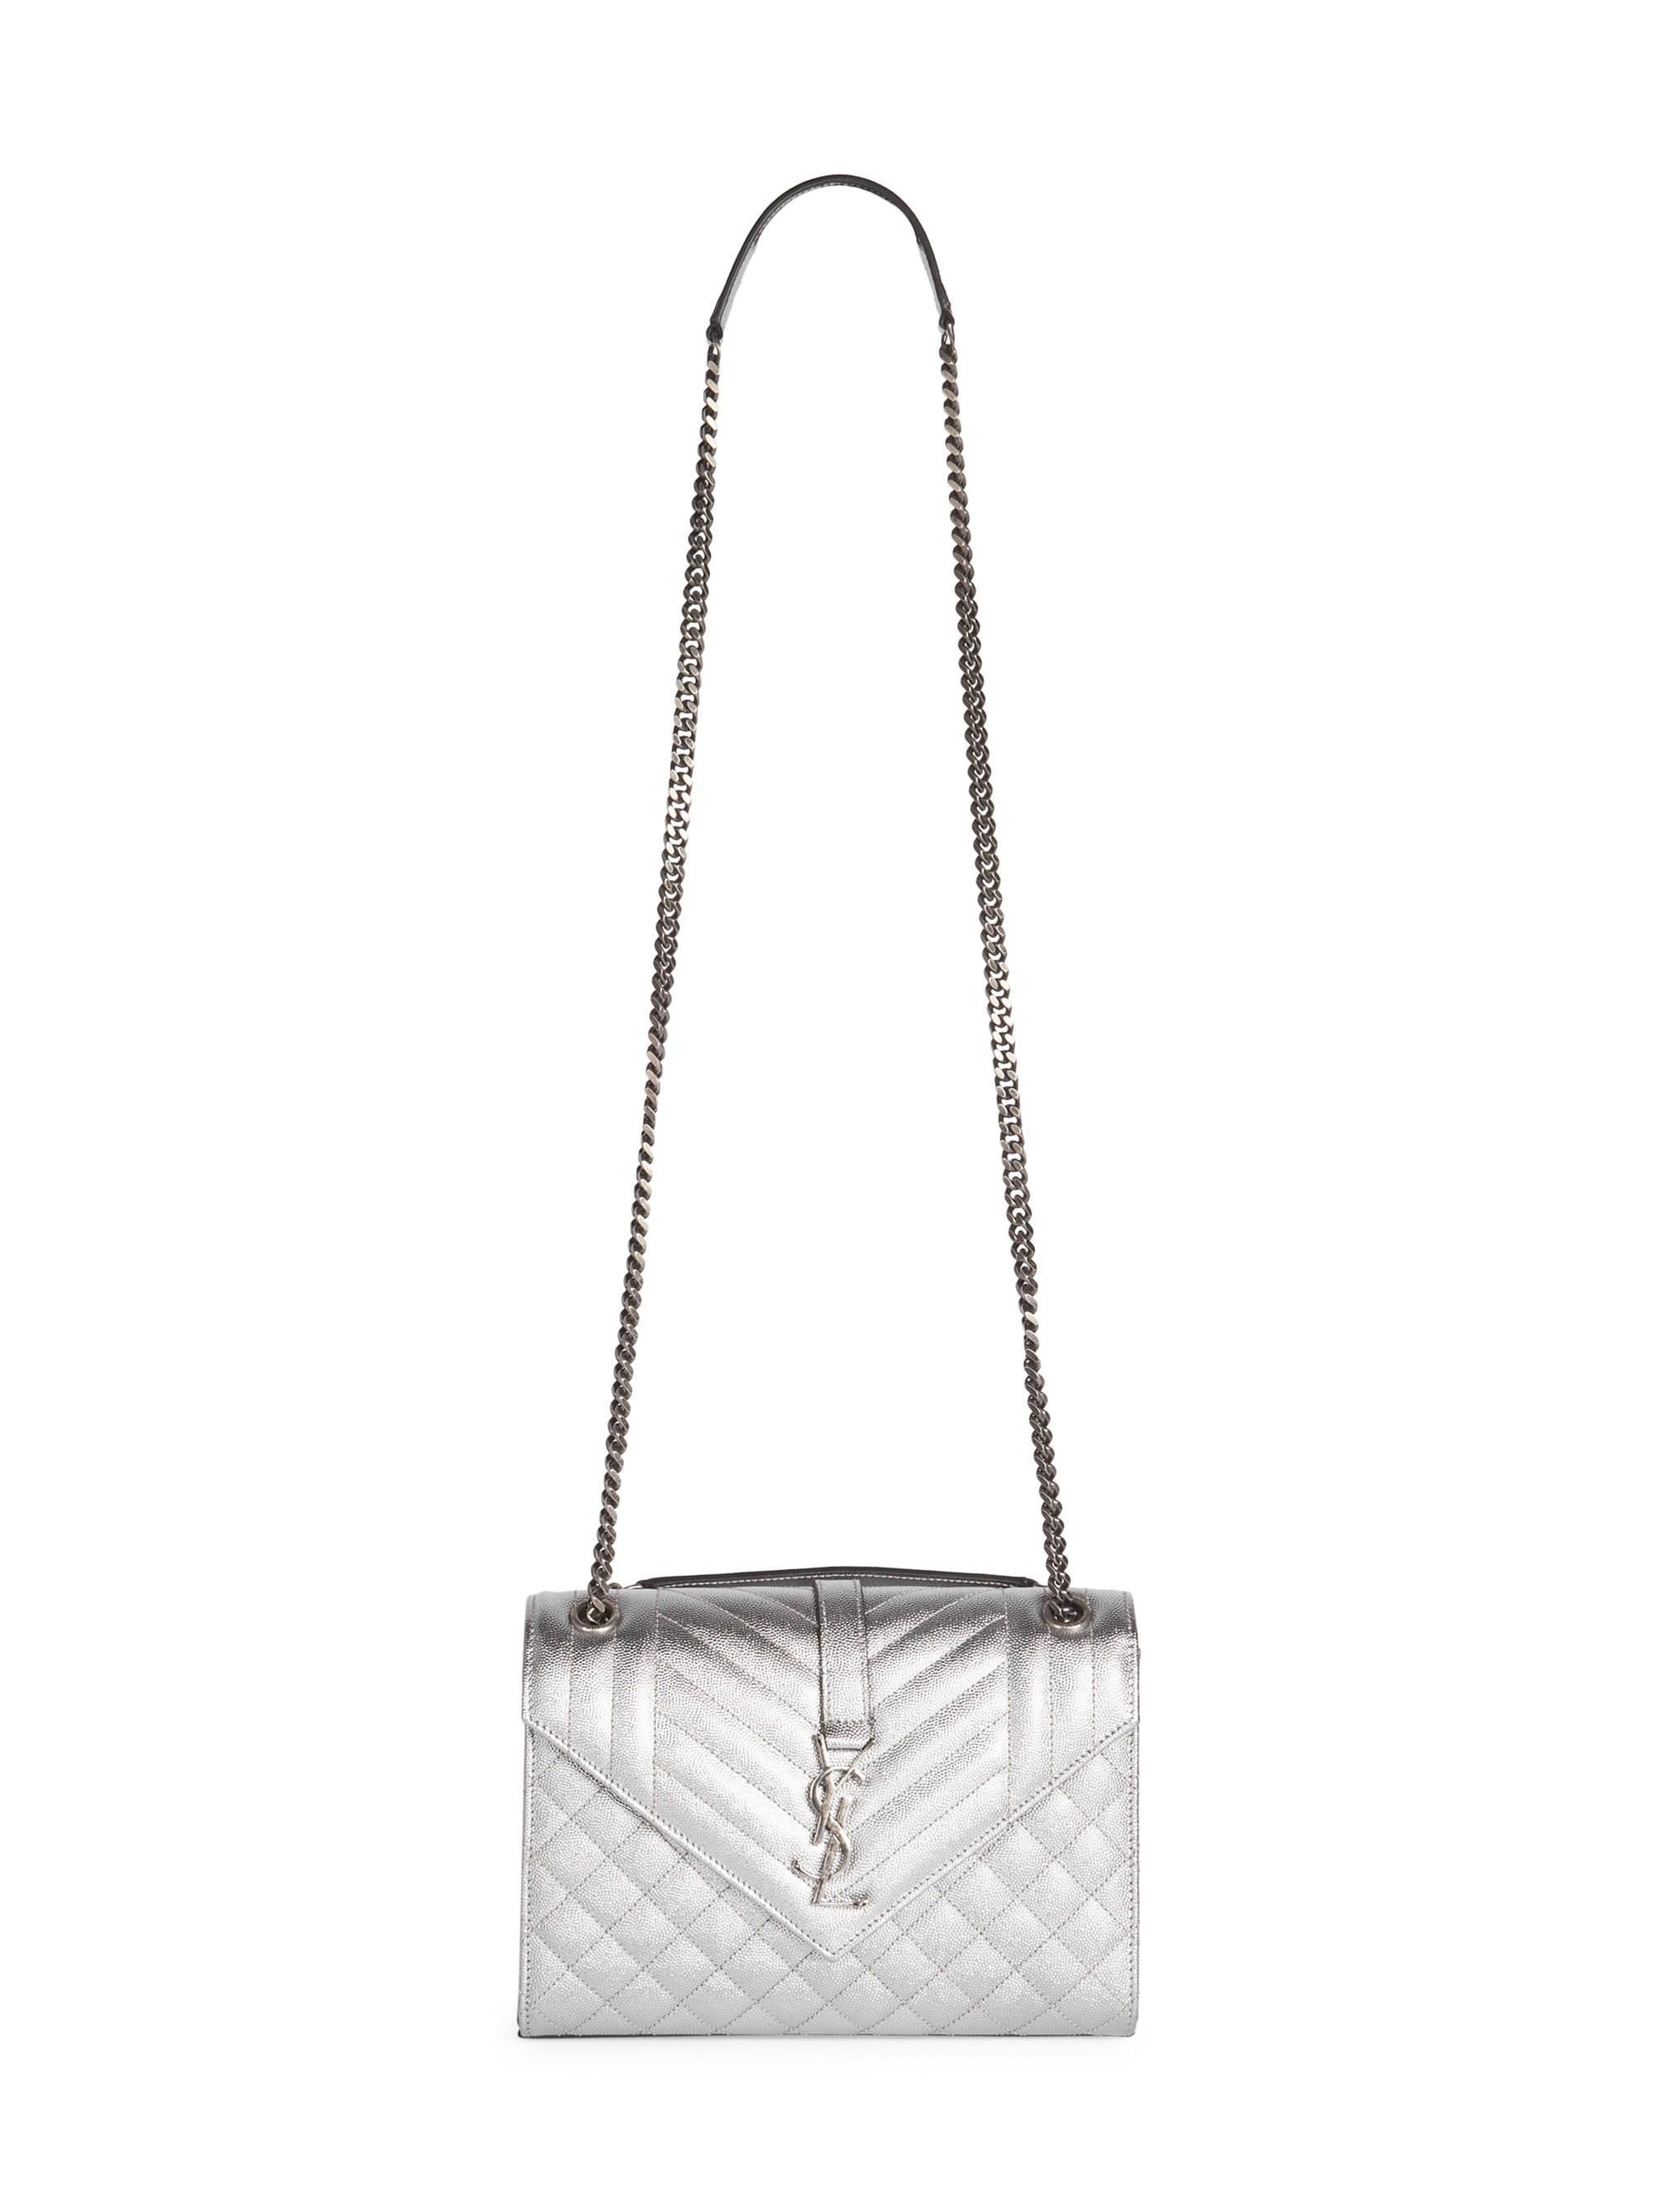 e699e3f926 Saint Laurent Women s Medium Embossed Leather Envelope Bag - Silver in  Metallic - Lyst